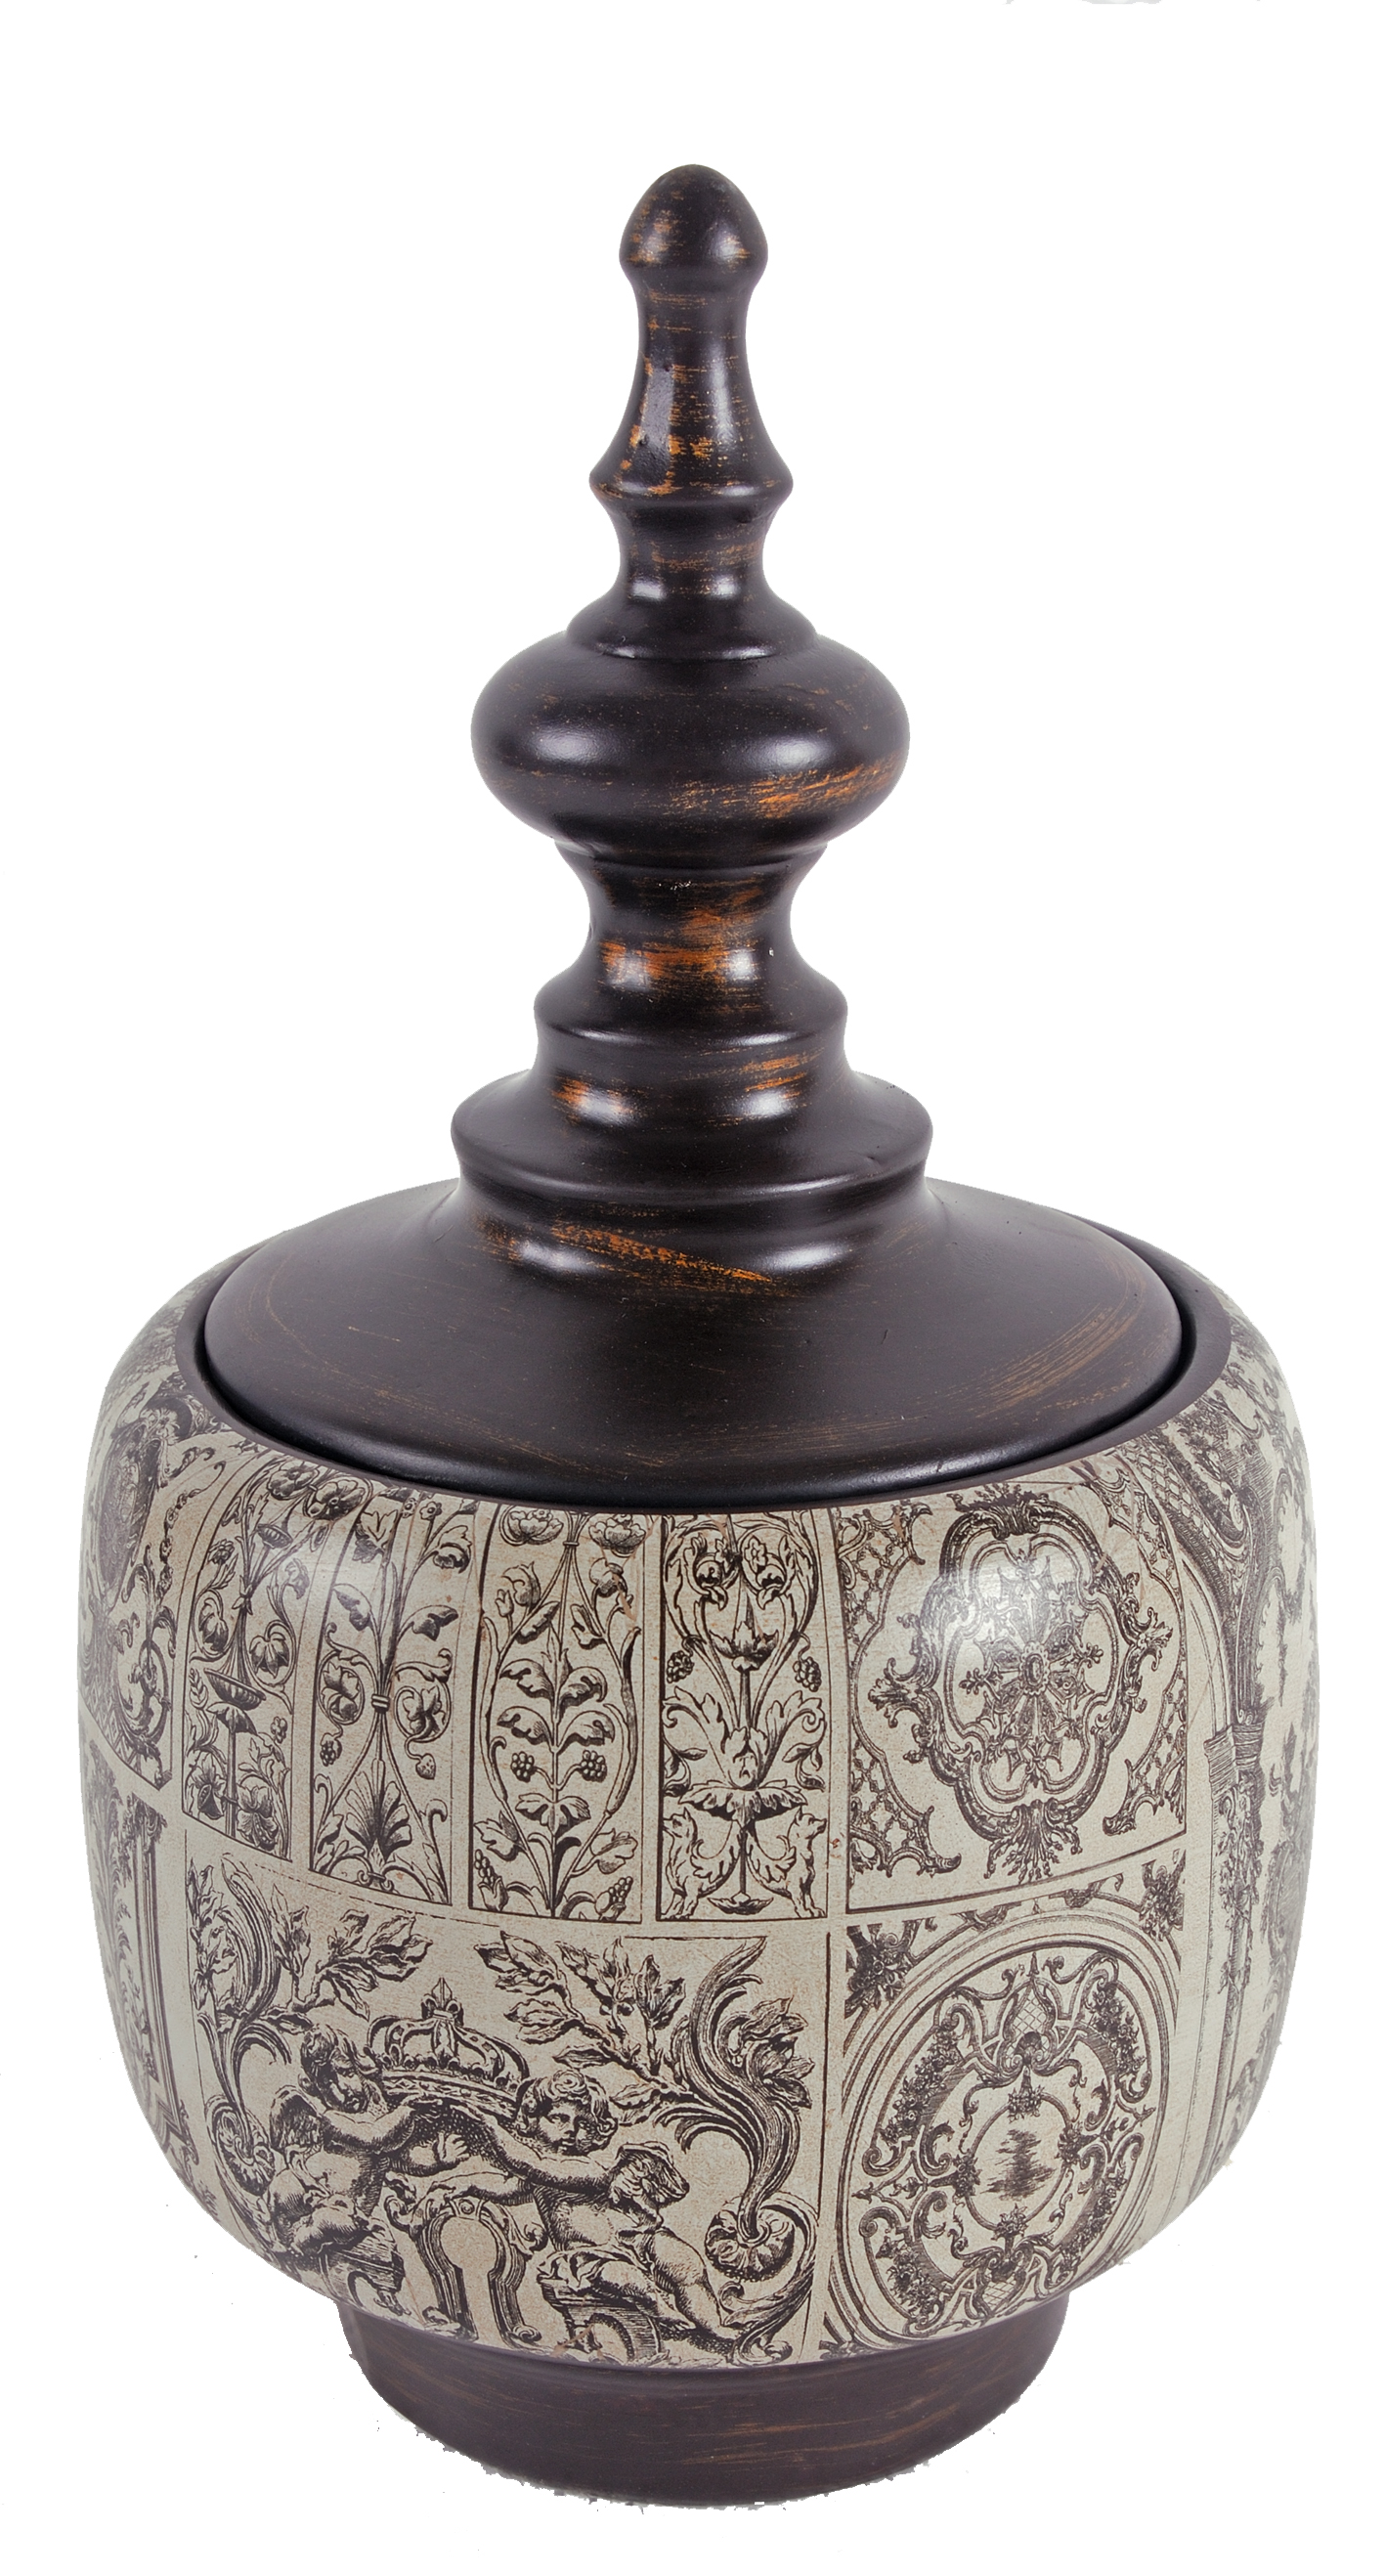 A&B Home Anthony Venetucci Ceramic Lidded Jar by A&B Home